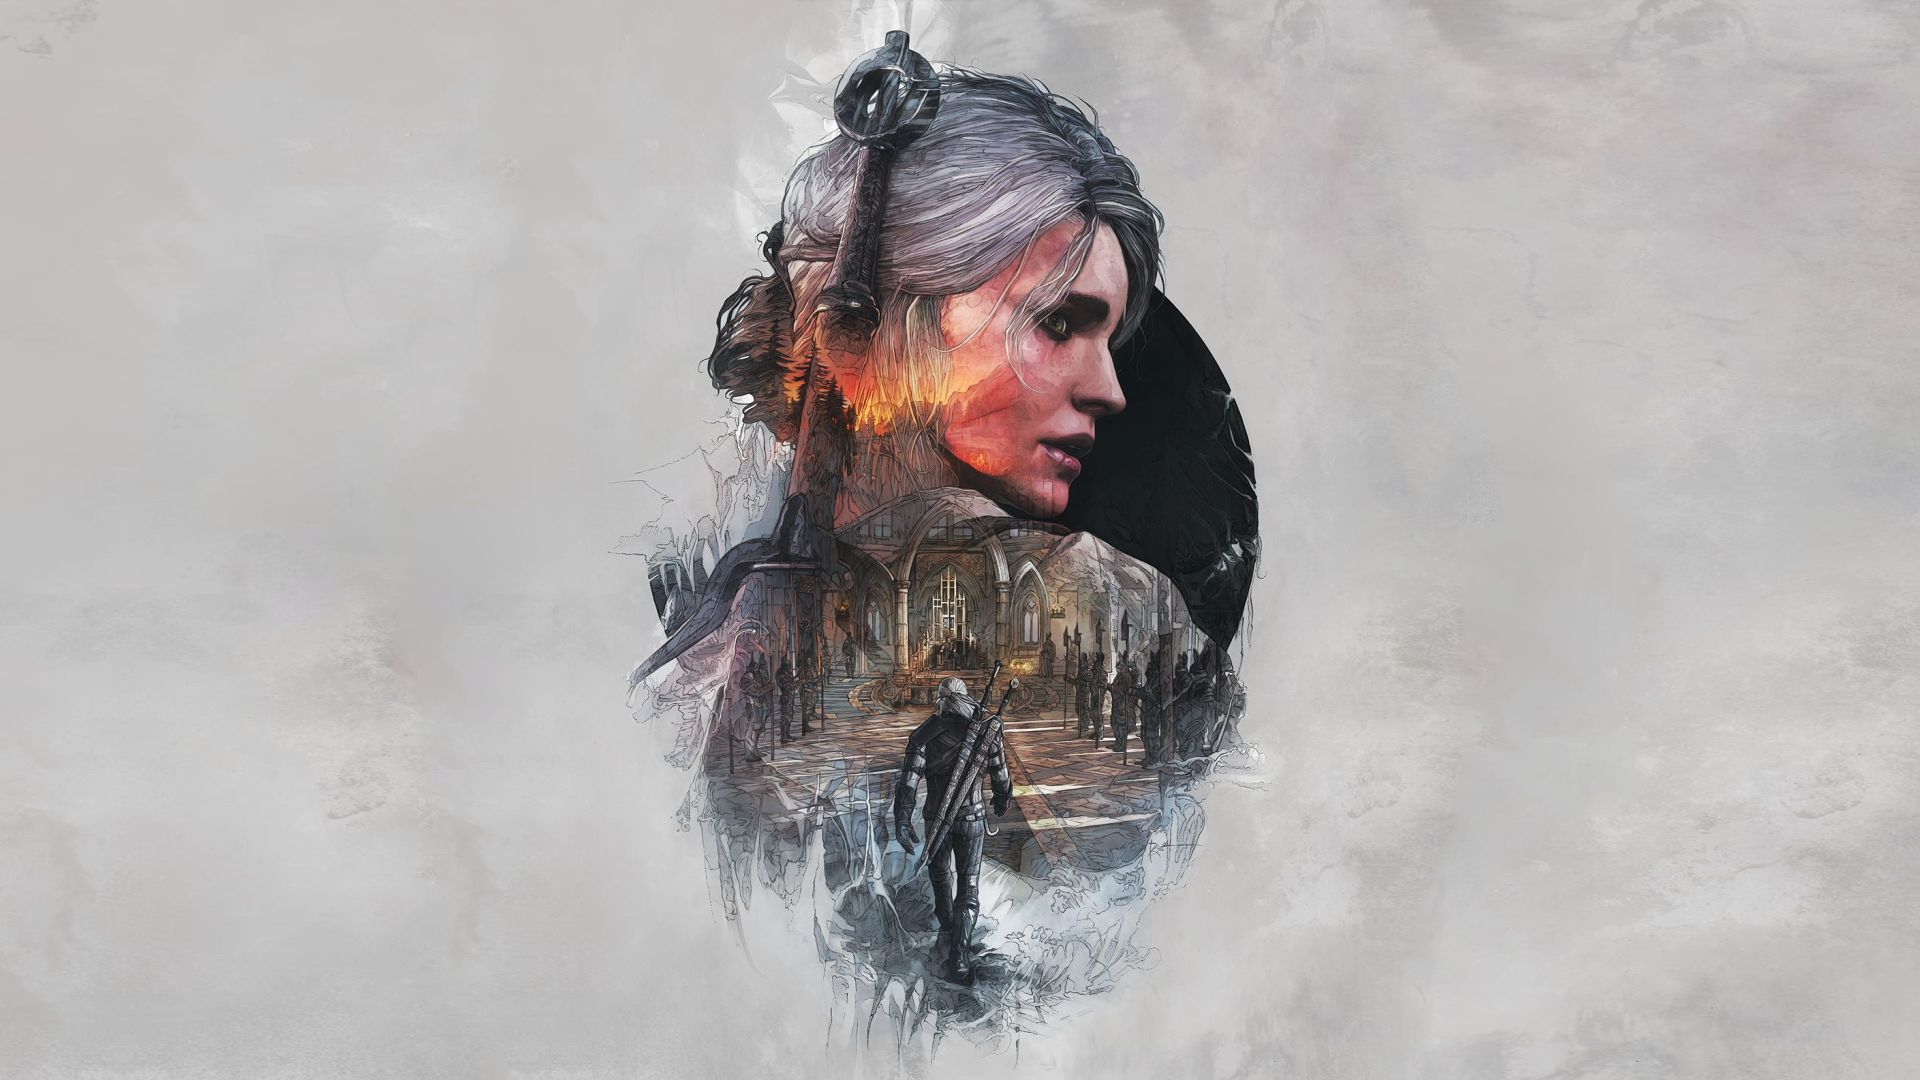 Witcher Ciri art, Free Wallpaper and Background